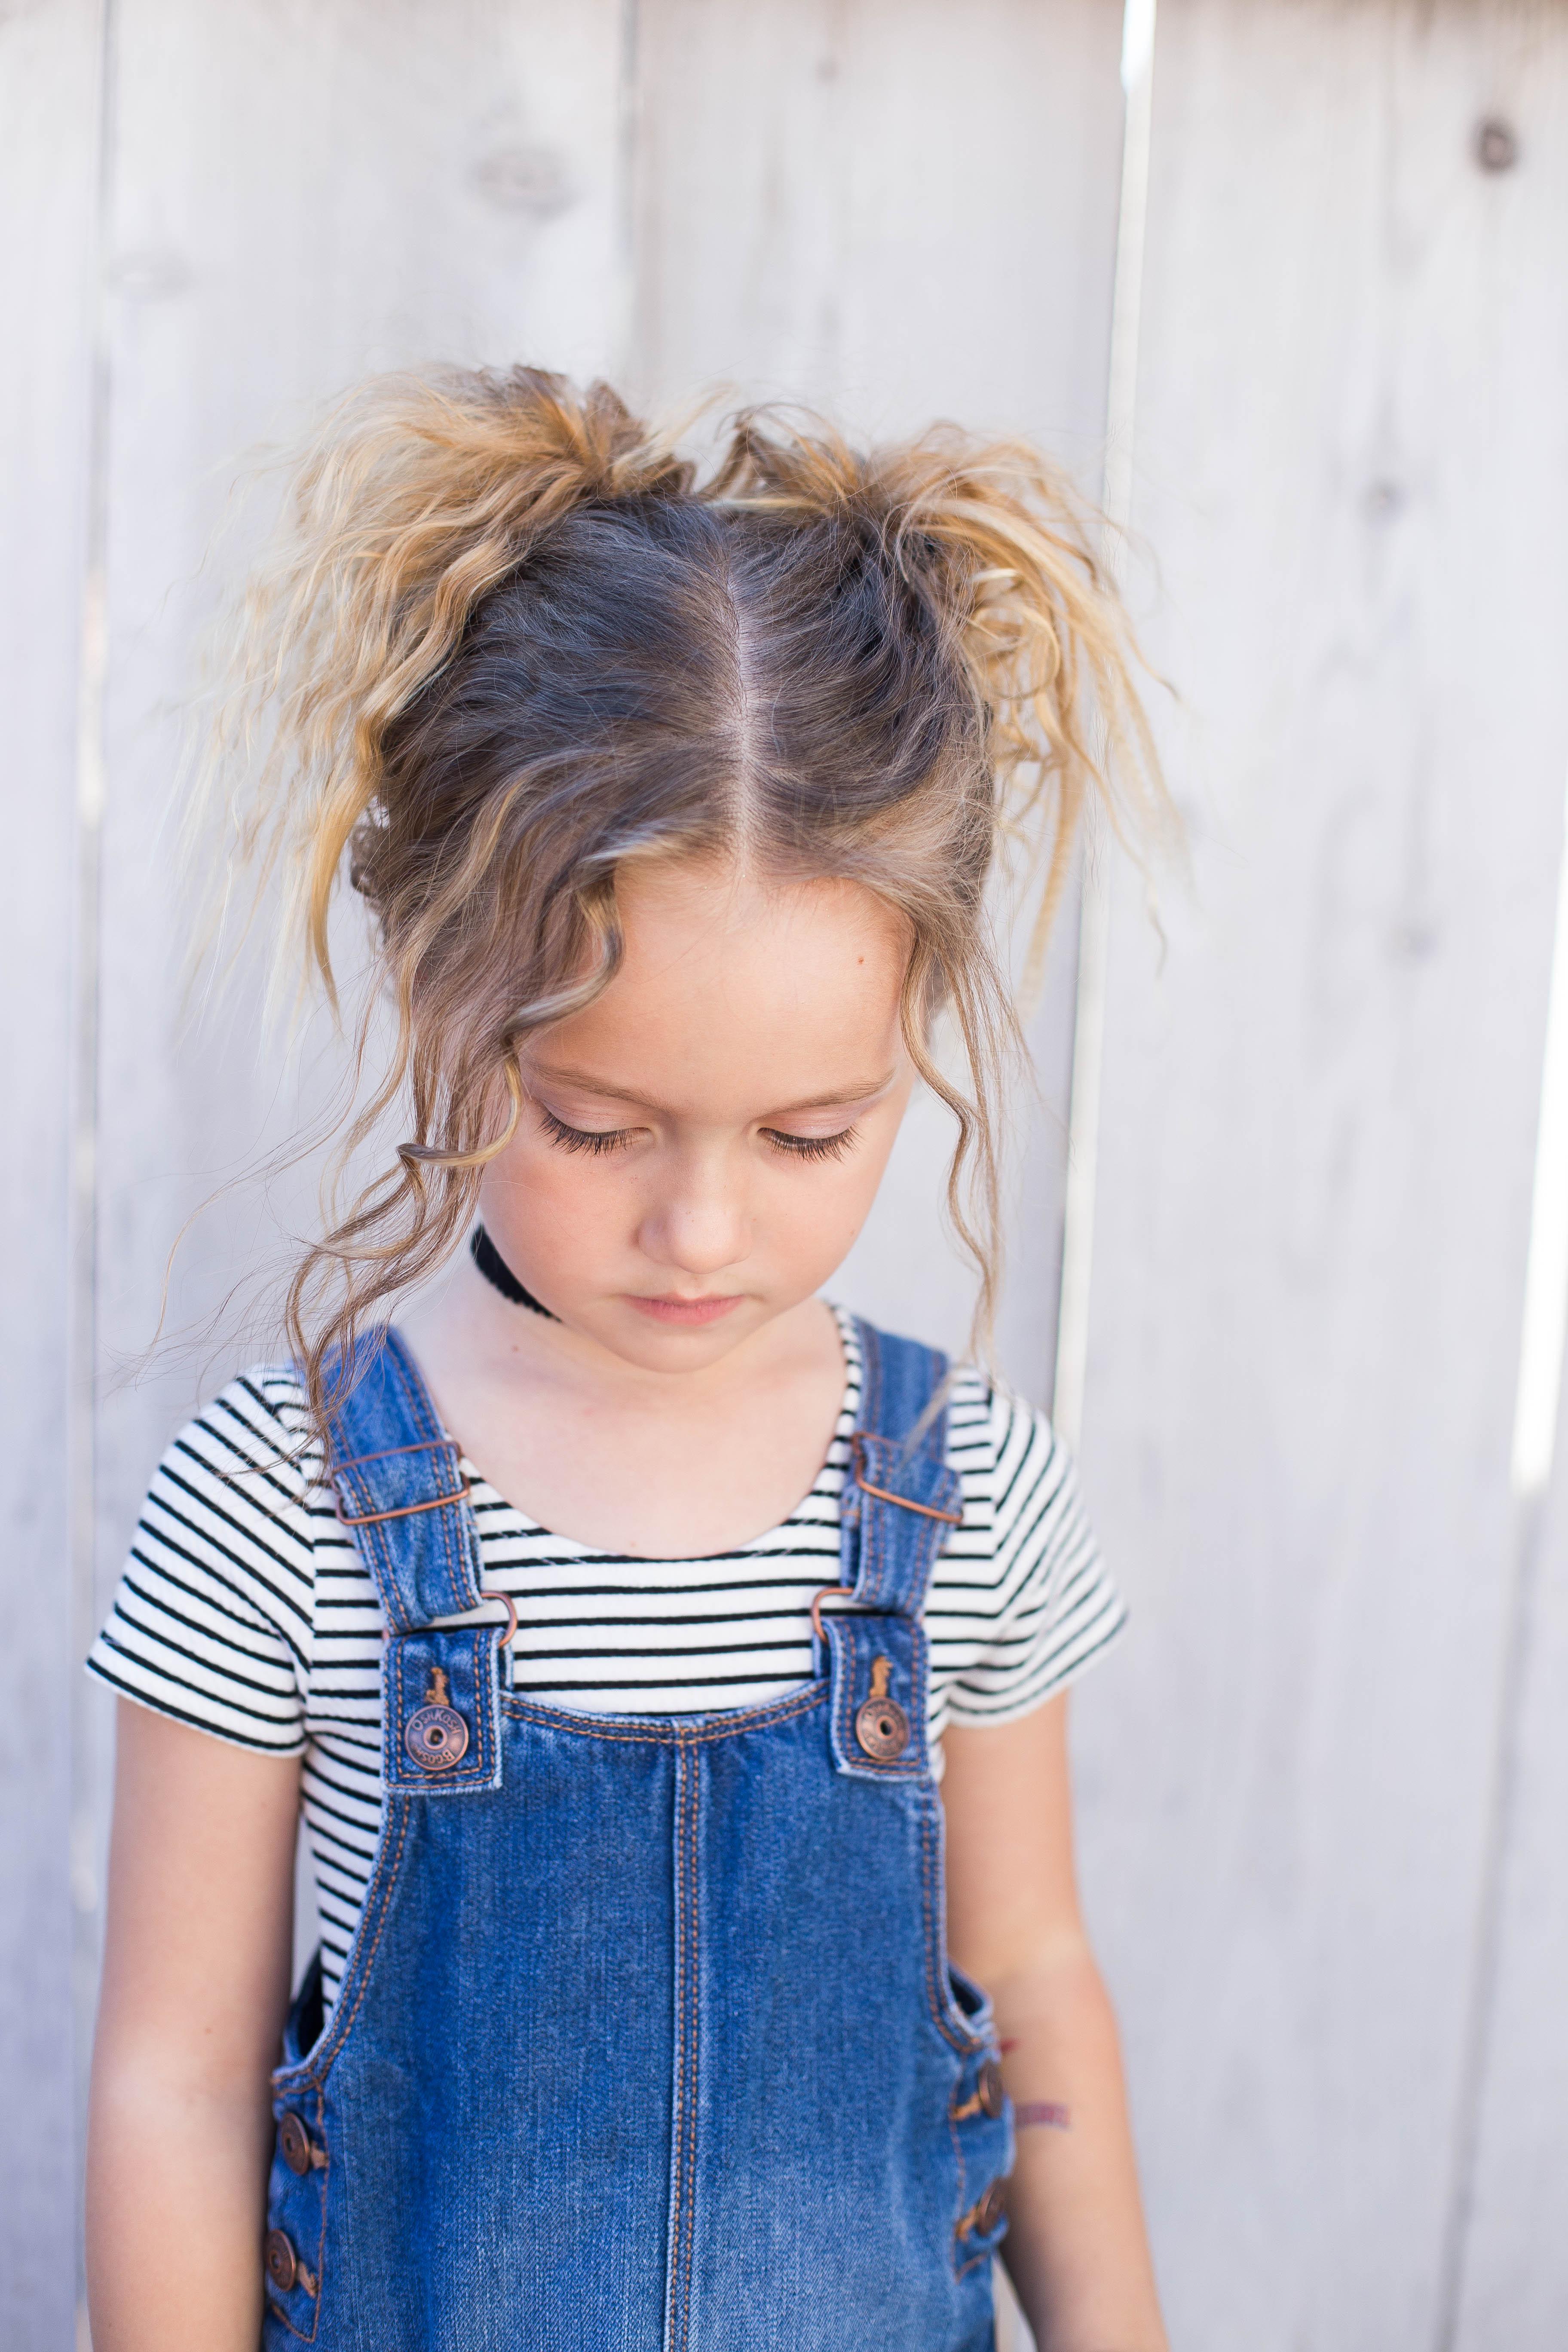 90's Hairstyles | Cute Girls Hairstyles